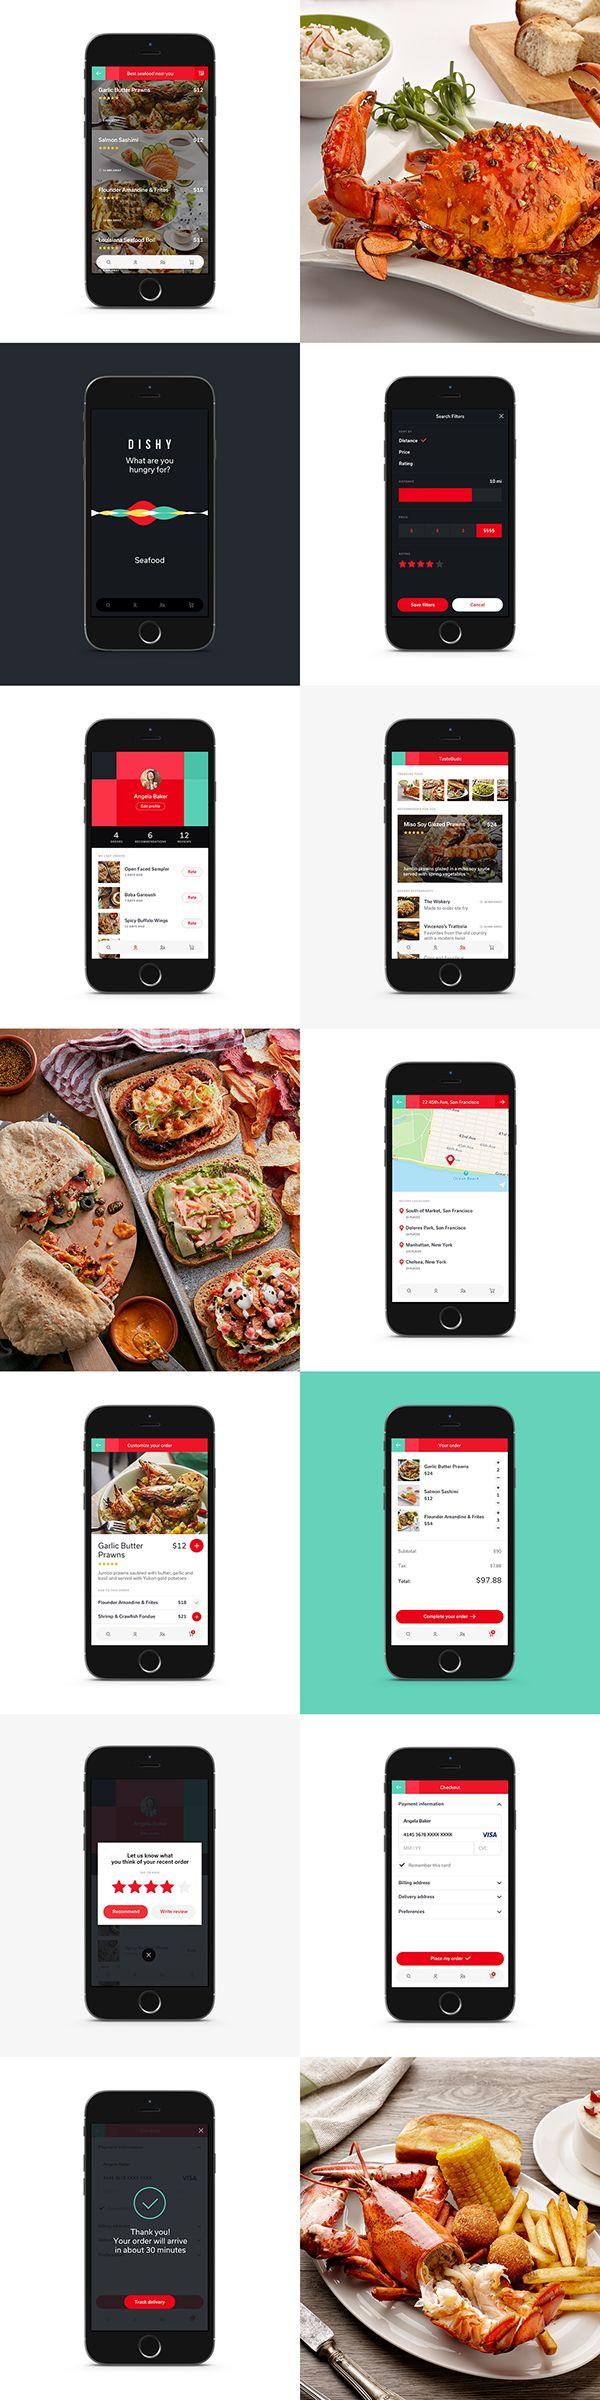 67 best App development images on Pinterest | App development ...